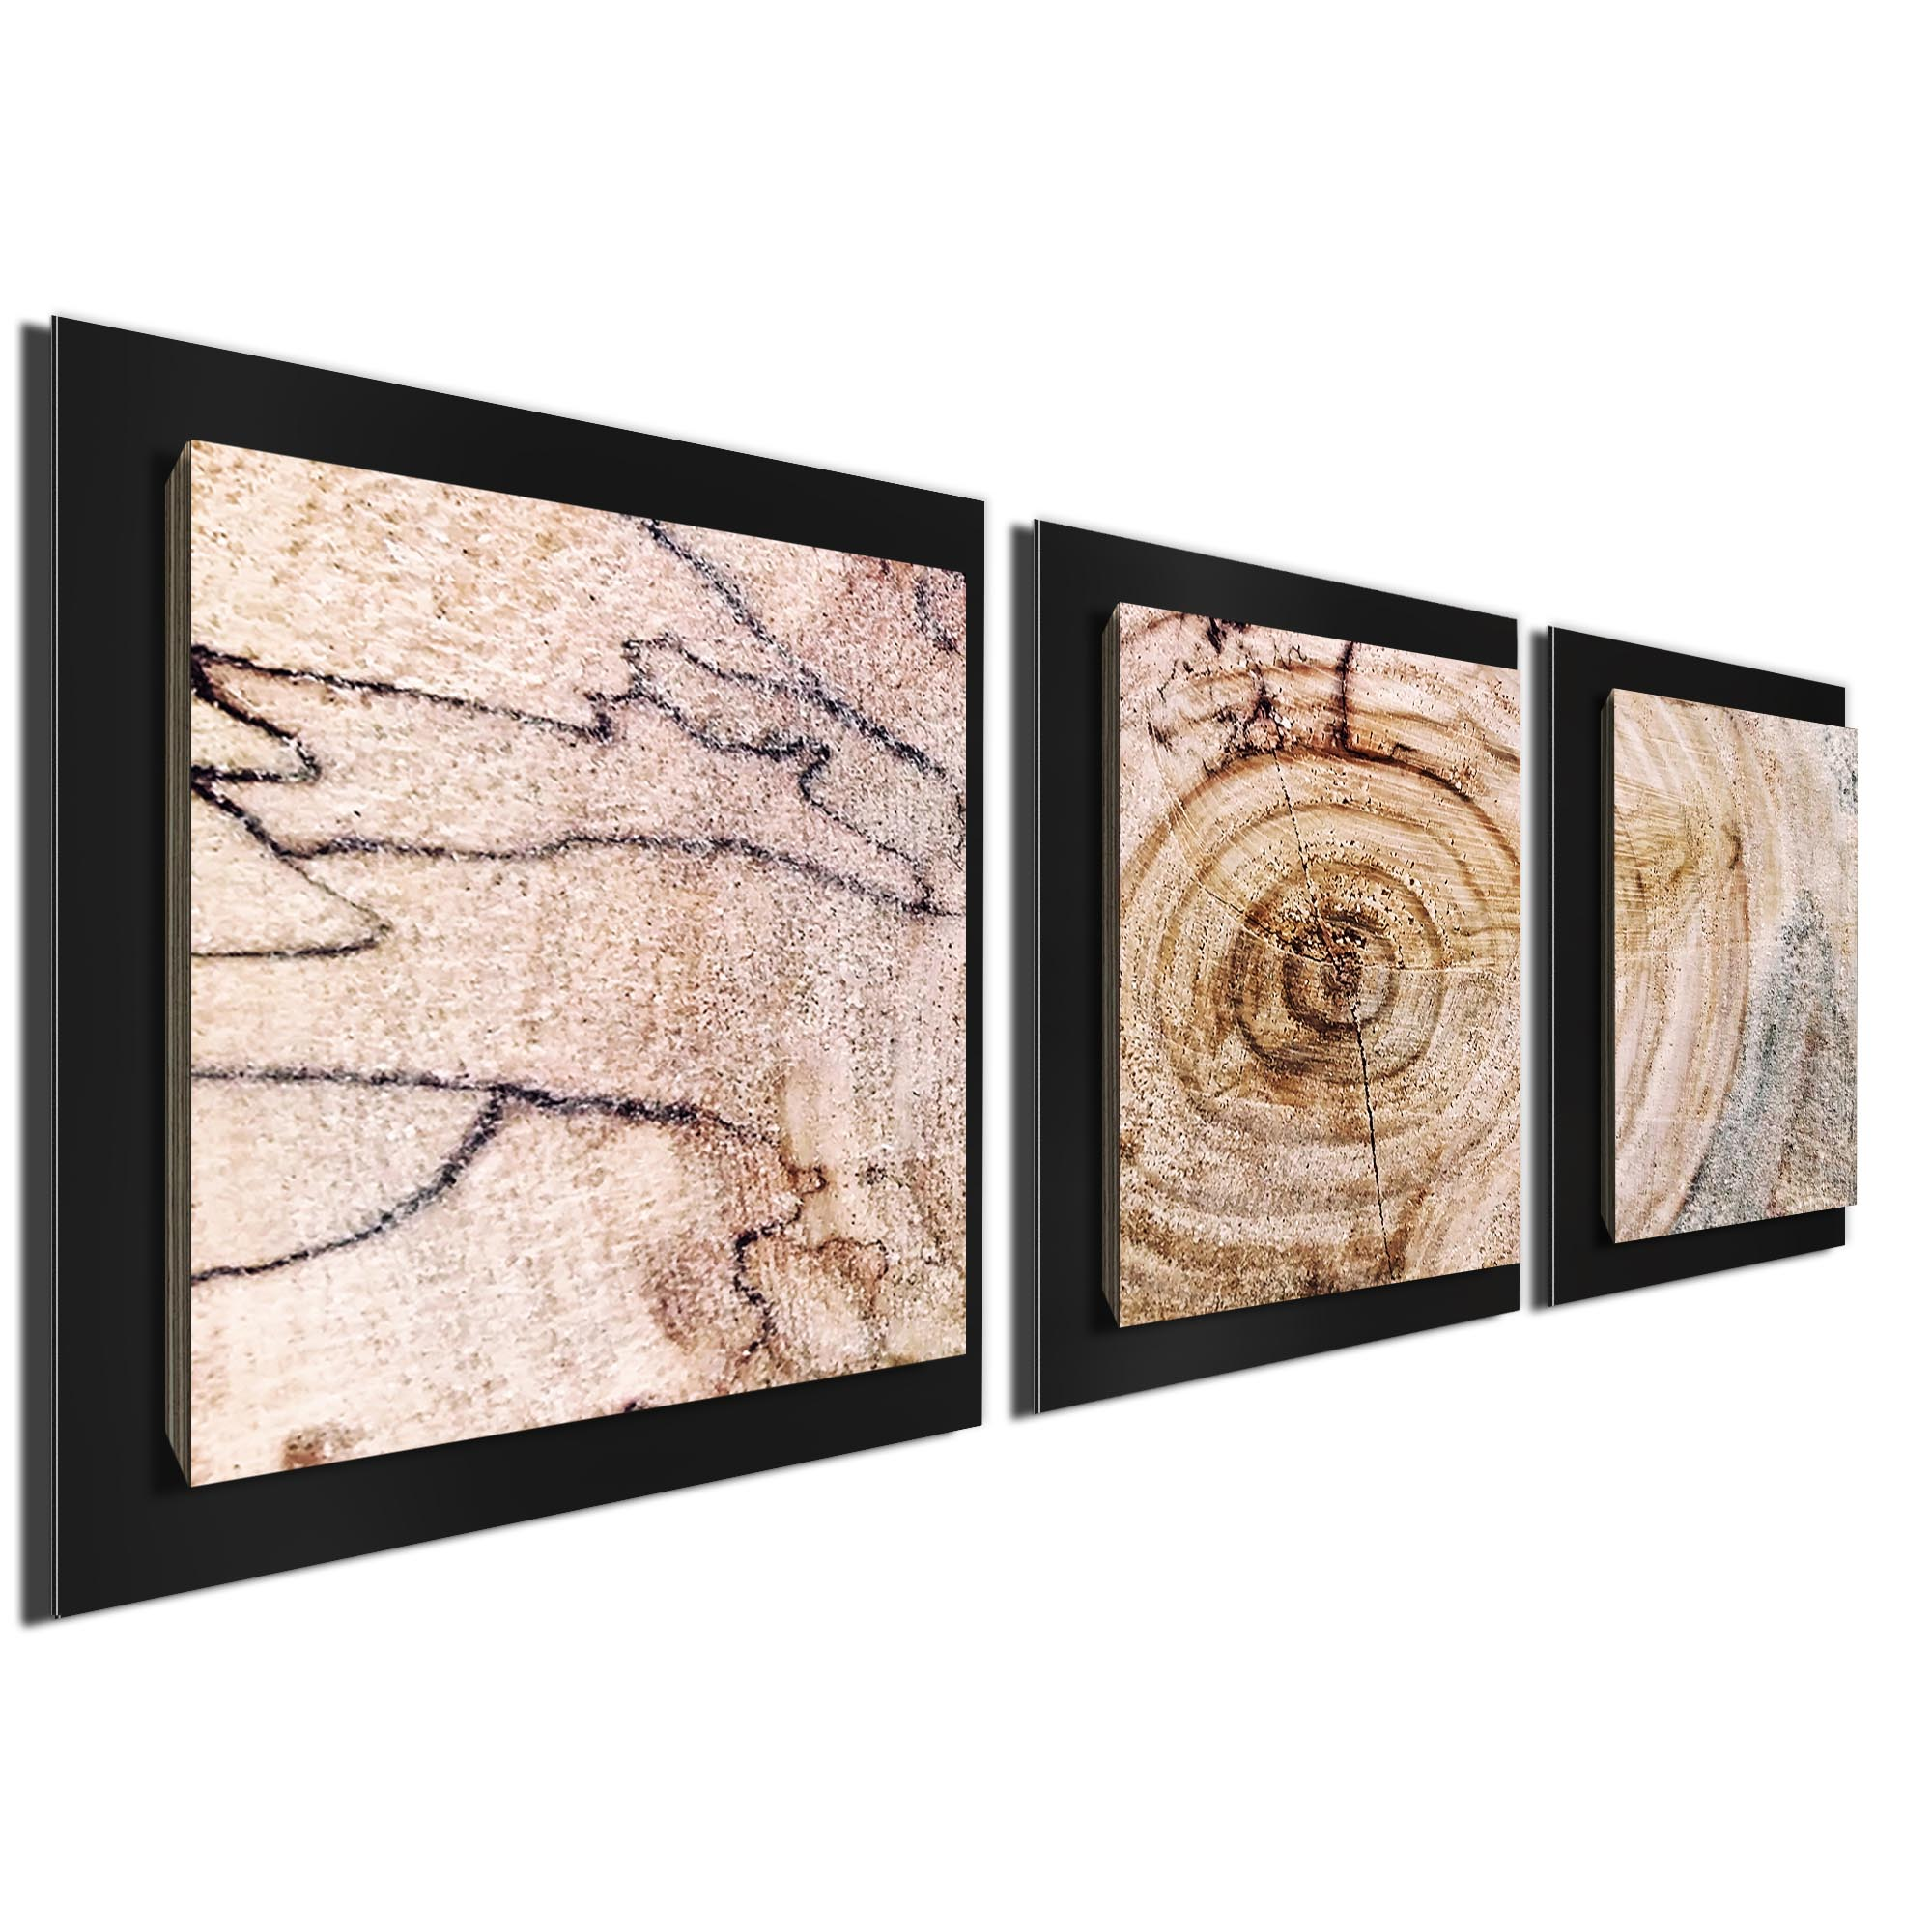 Aged Wood Essence Black by Adam Schwoeppe Rustic Modern Style Wood Wall Art - Image 2